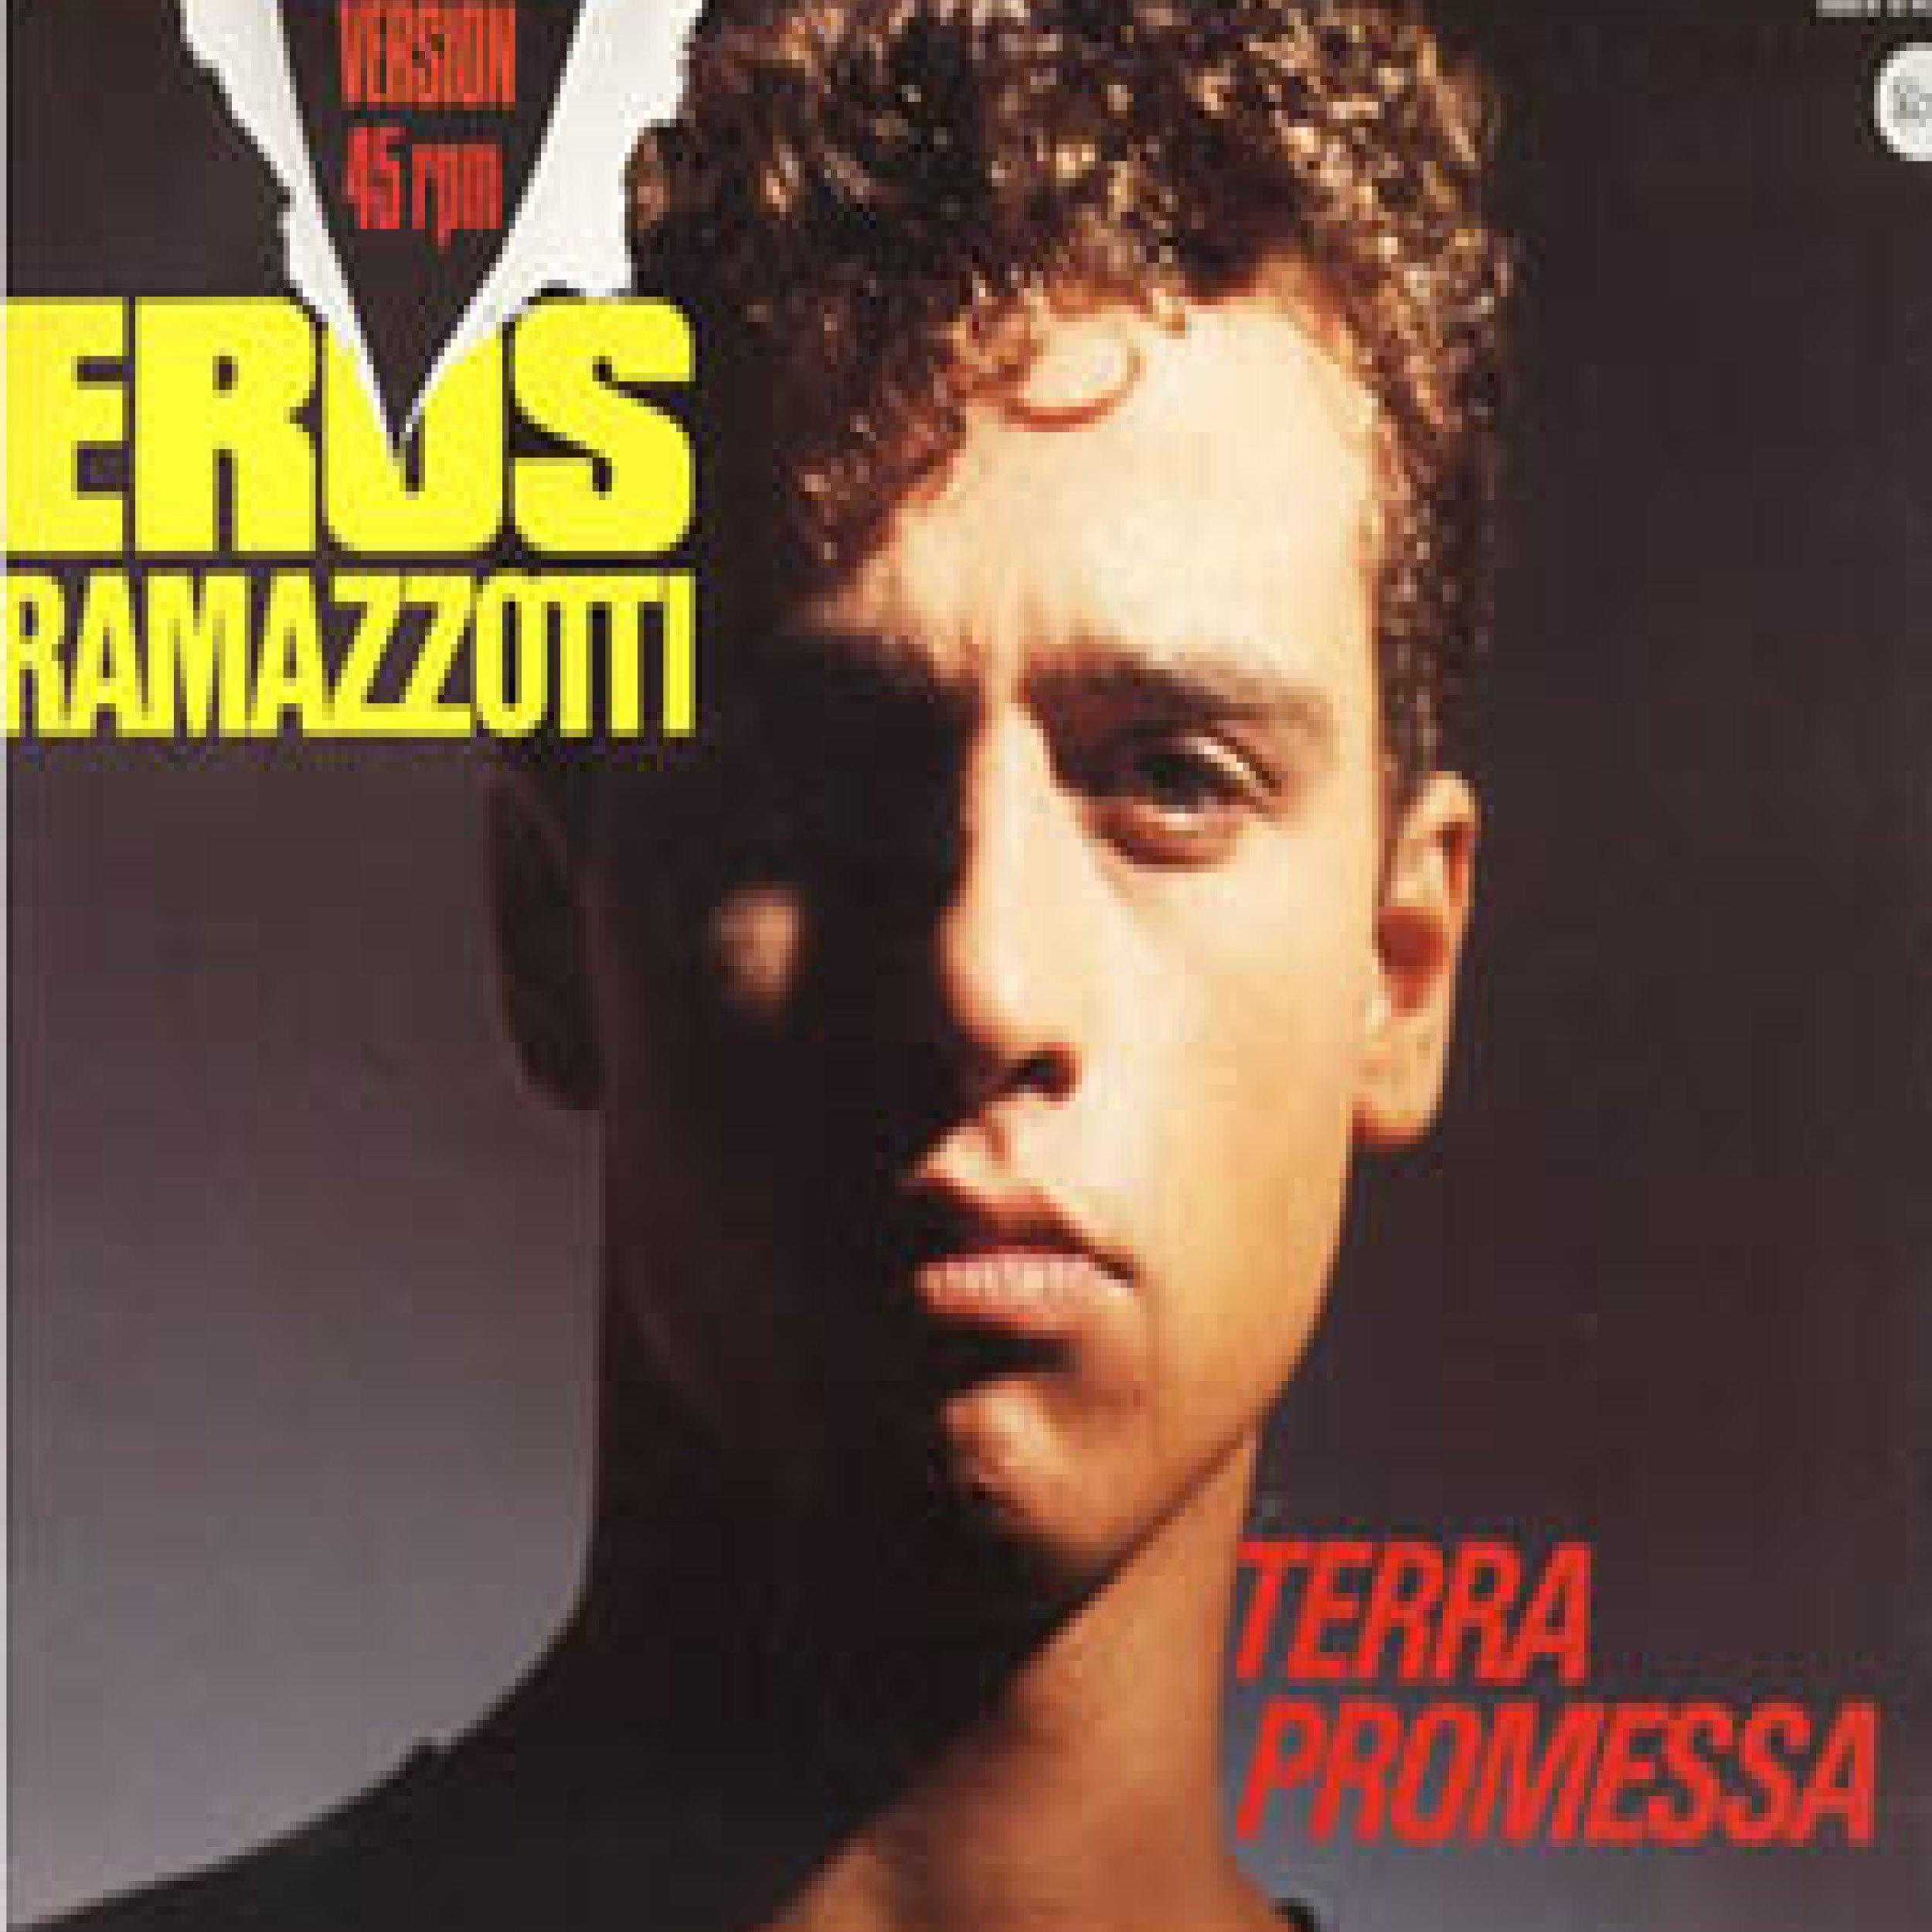 Italian Songs: Terra promessa